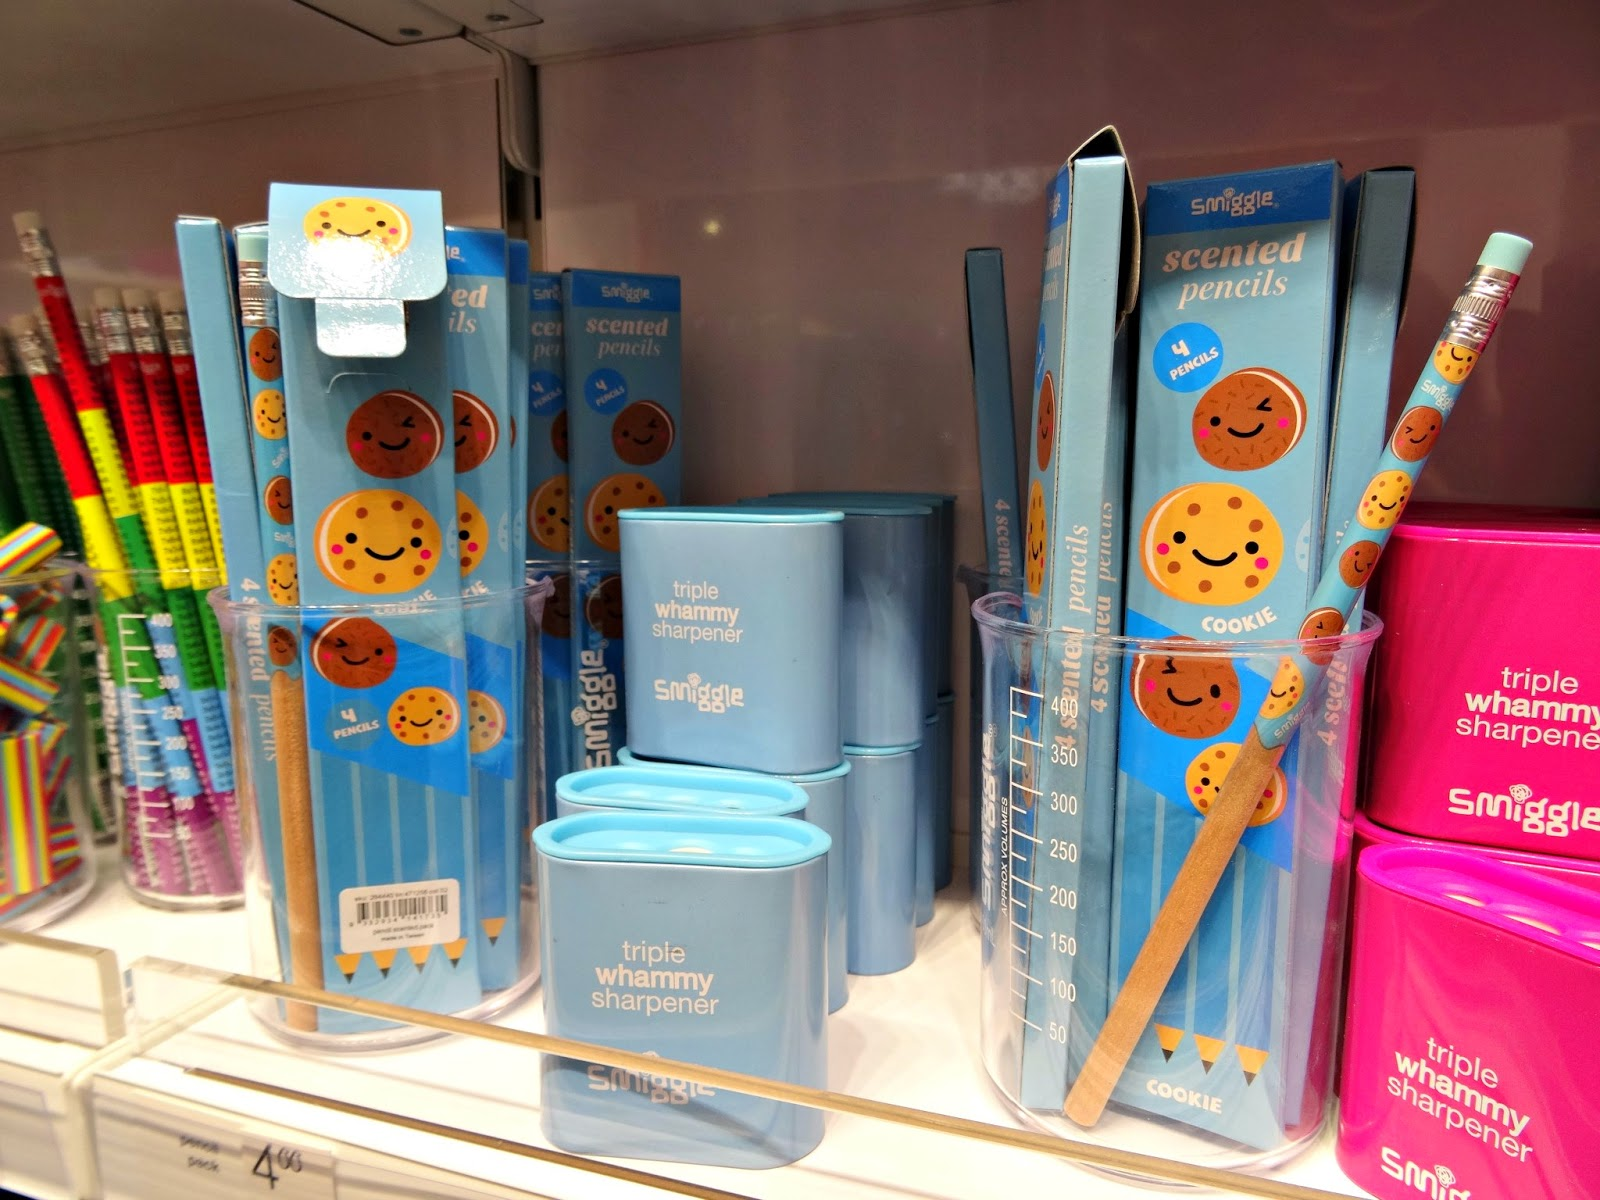 Smiggle pencils and milk pencil case